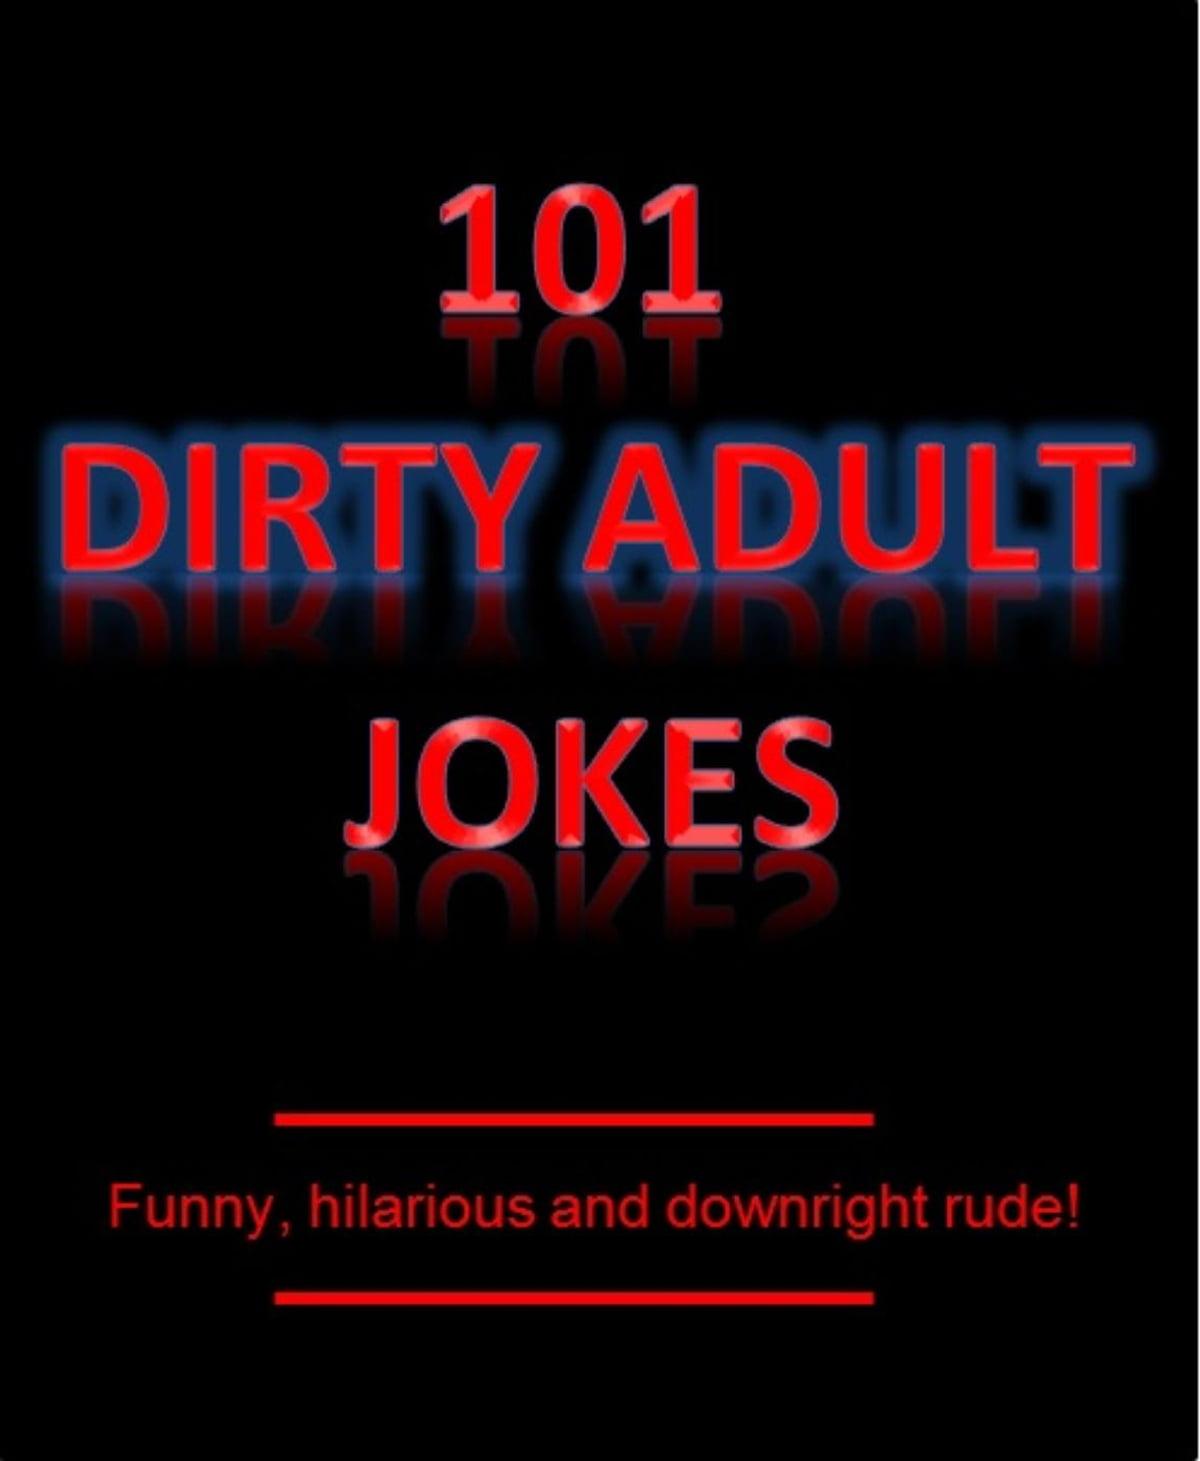 Funny Short Sex Poems : funny, short, poems, Dirty, Adult, Jokes!, Funny,, Hilarious, Downright, Rude!, EBook, Short, Jokes, 9781502208668, Rakuten, United, States